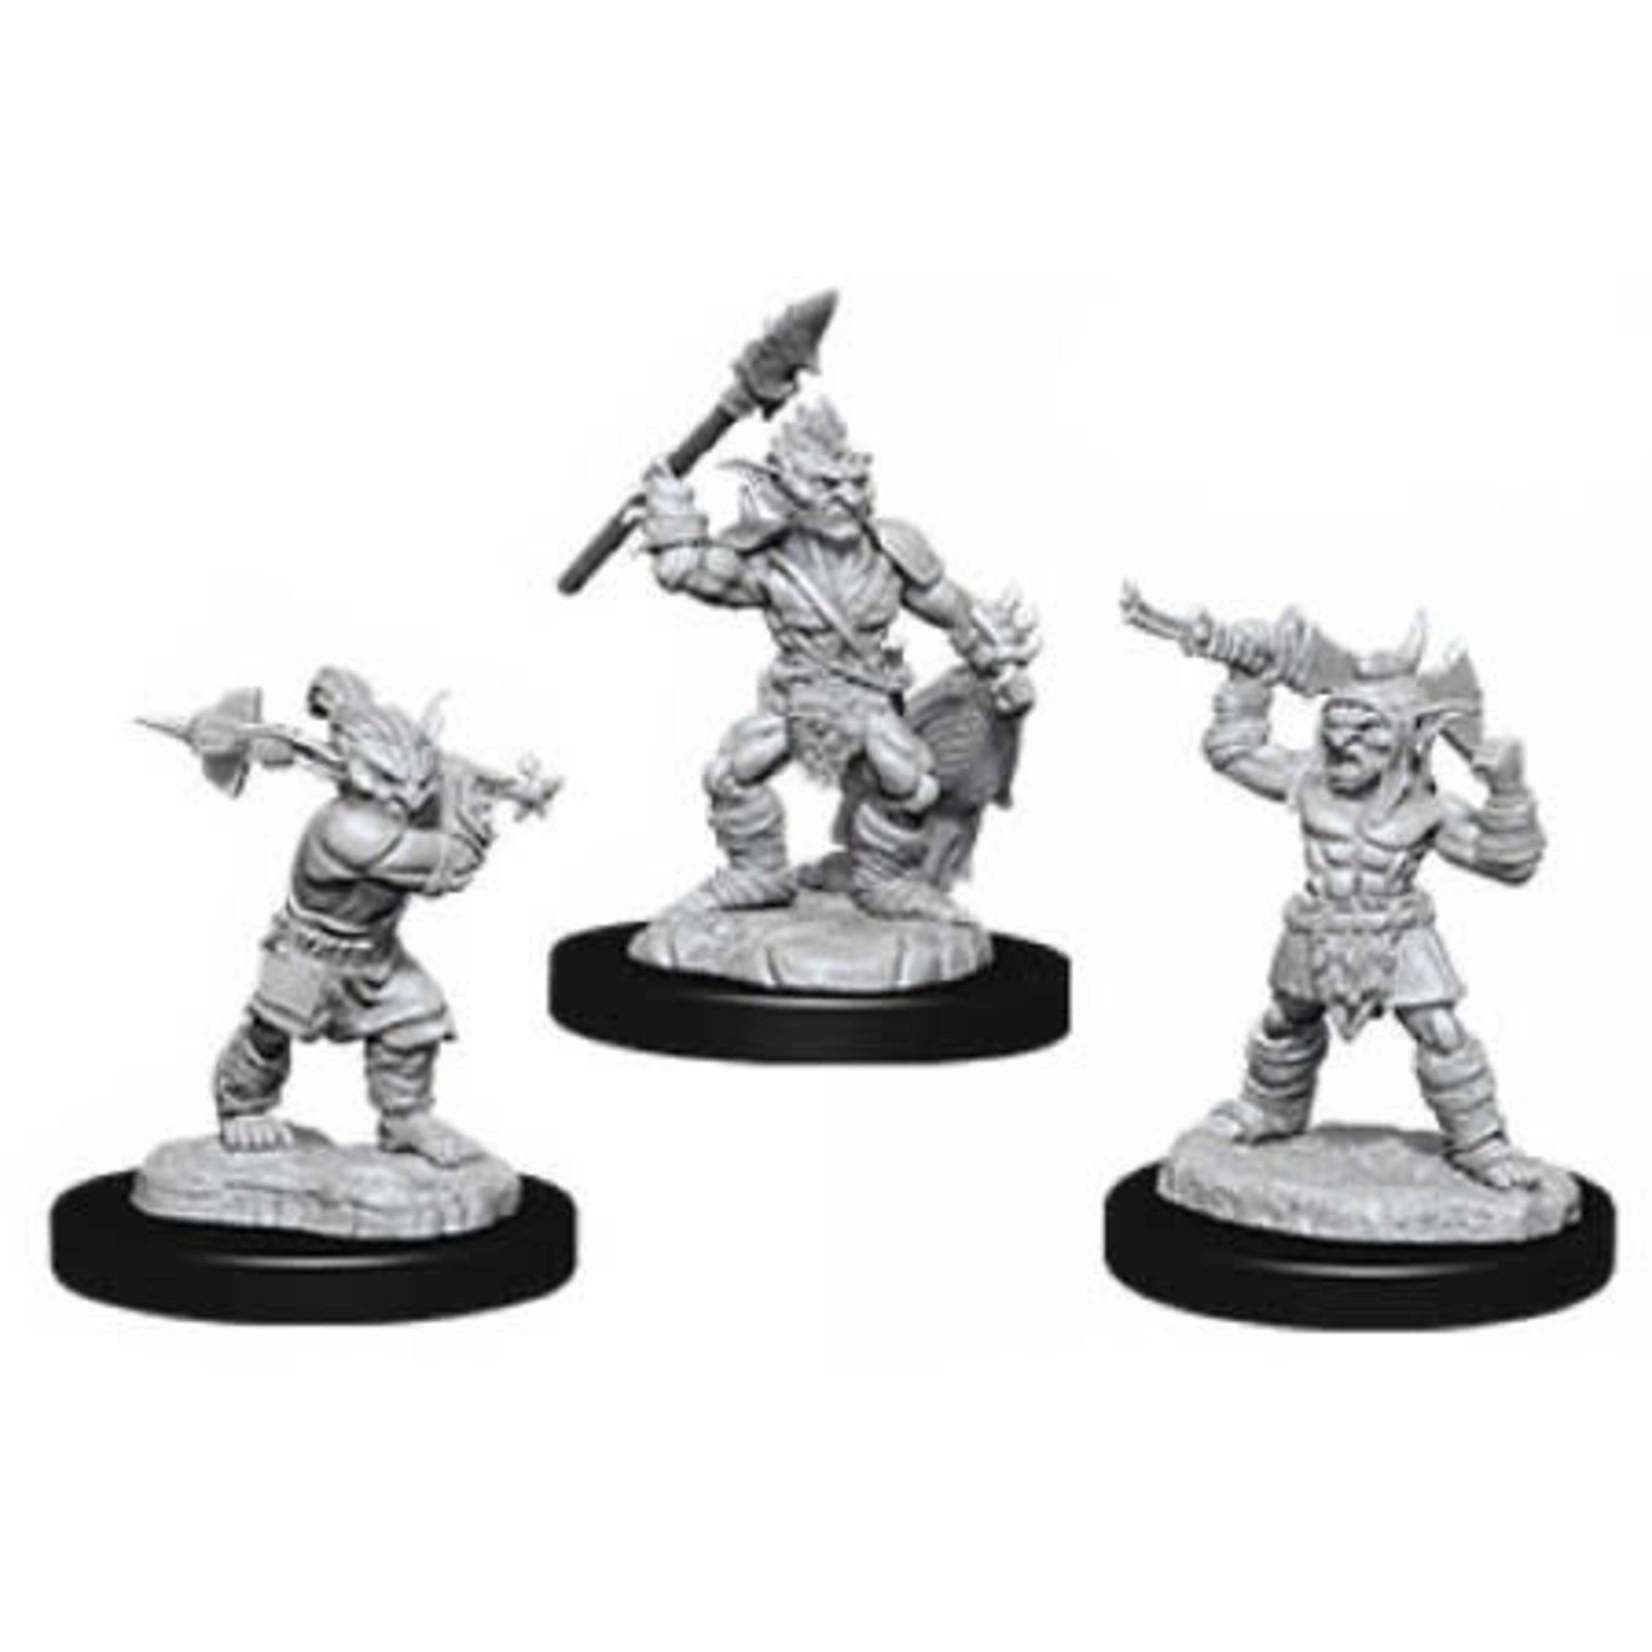 WizKids/Neca 90063 Nolzur's Goblins & Goblin Boss